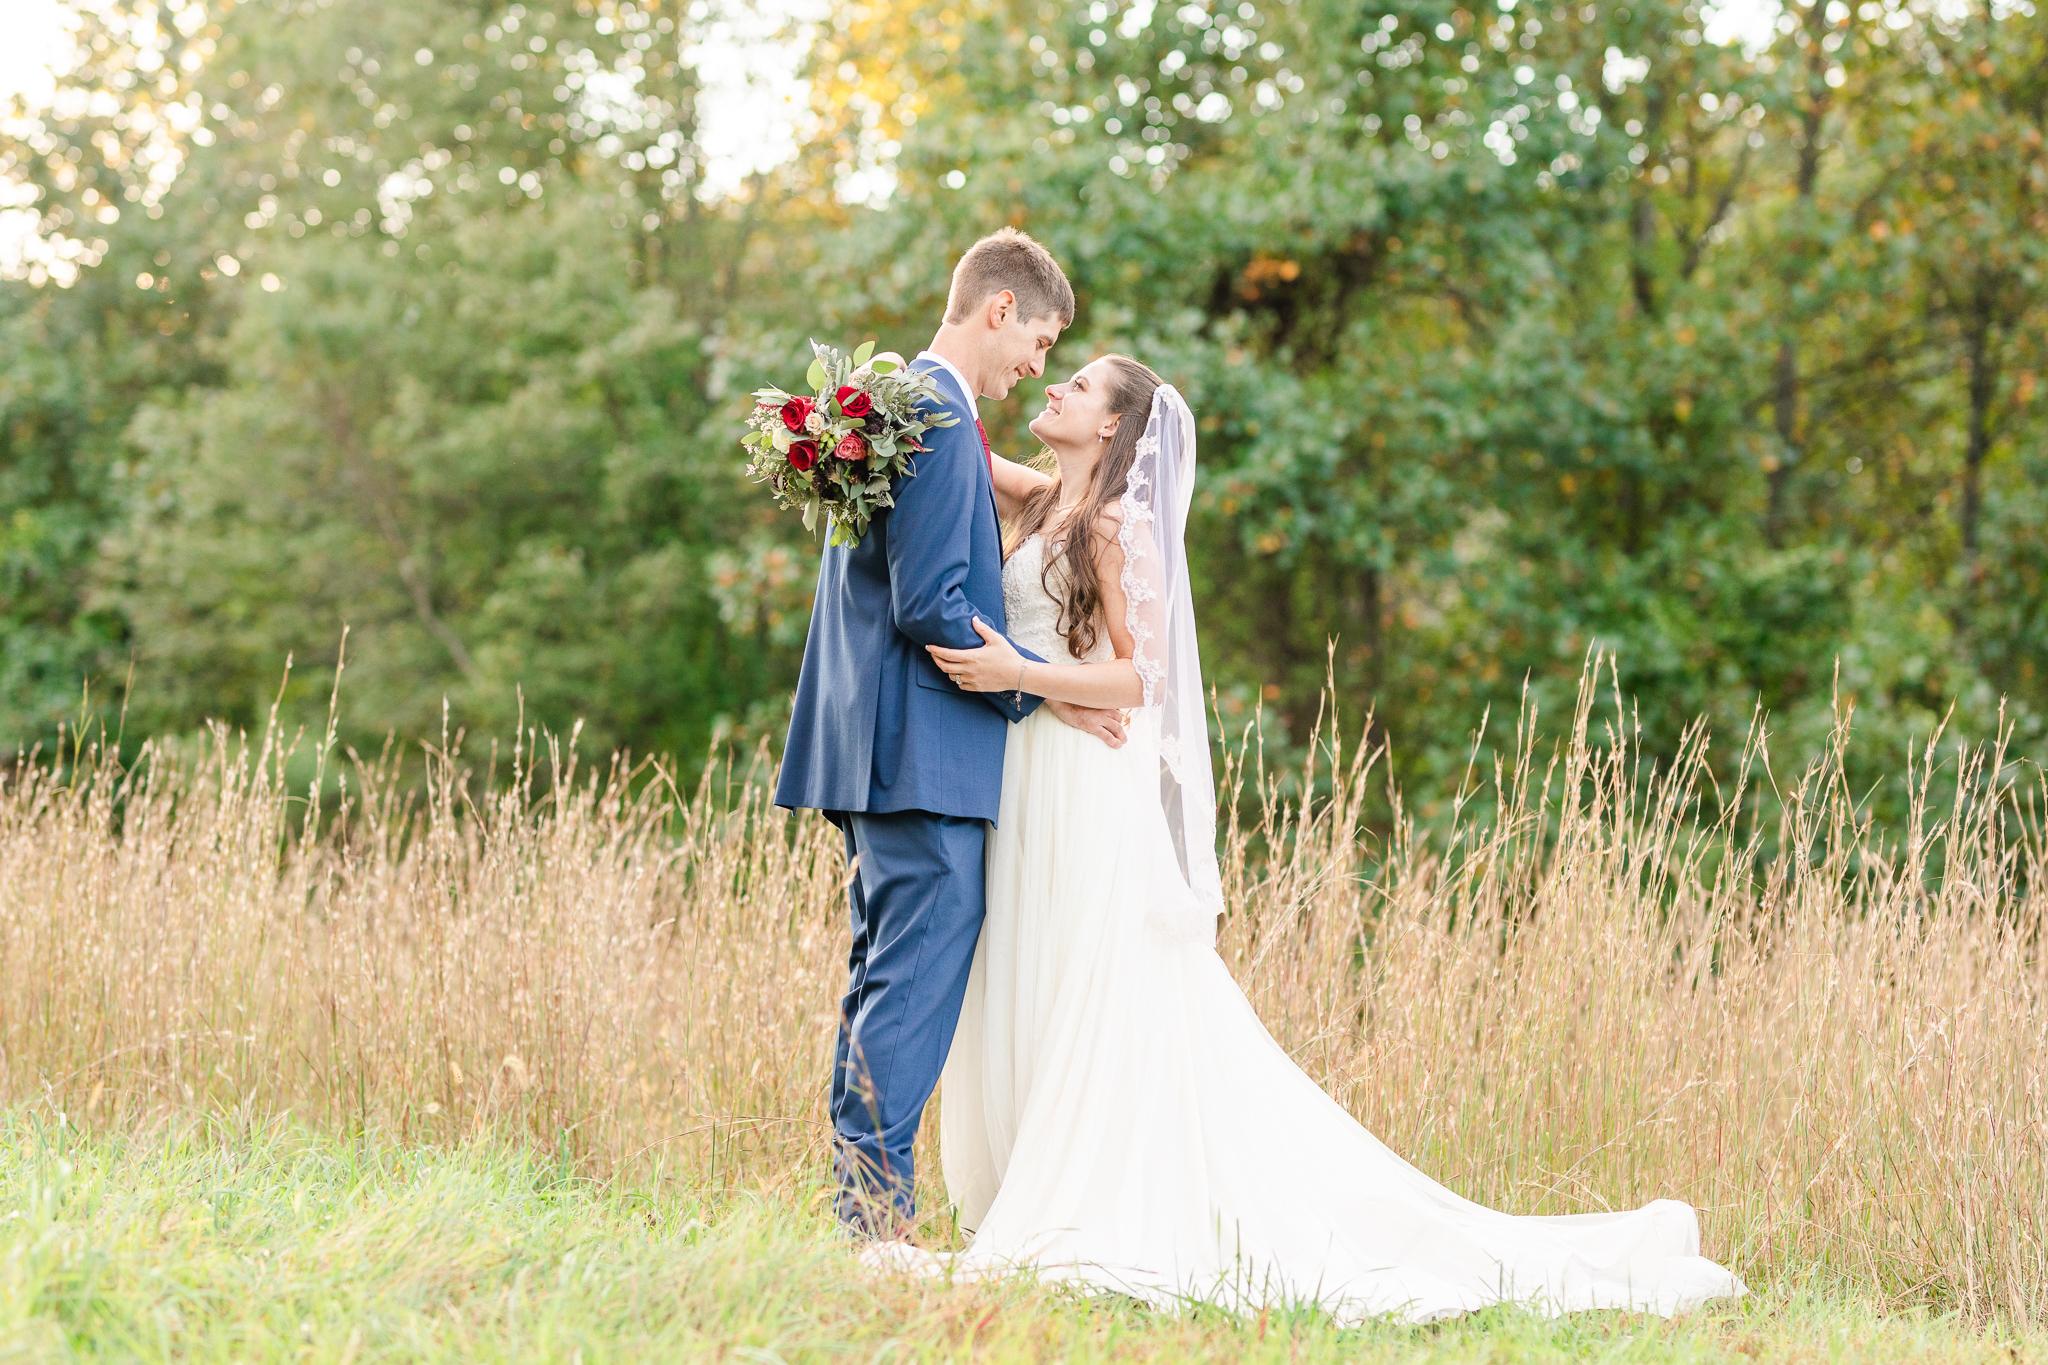 Maryland-Farm-Wedding-Photos-8.jpg